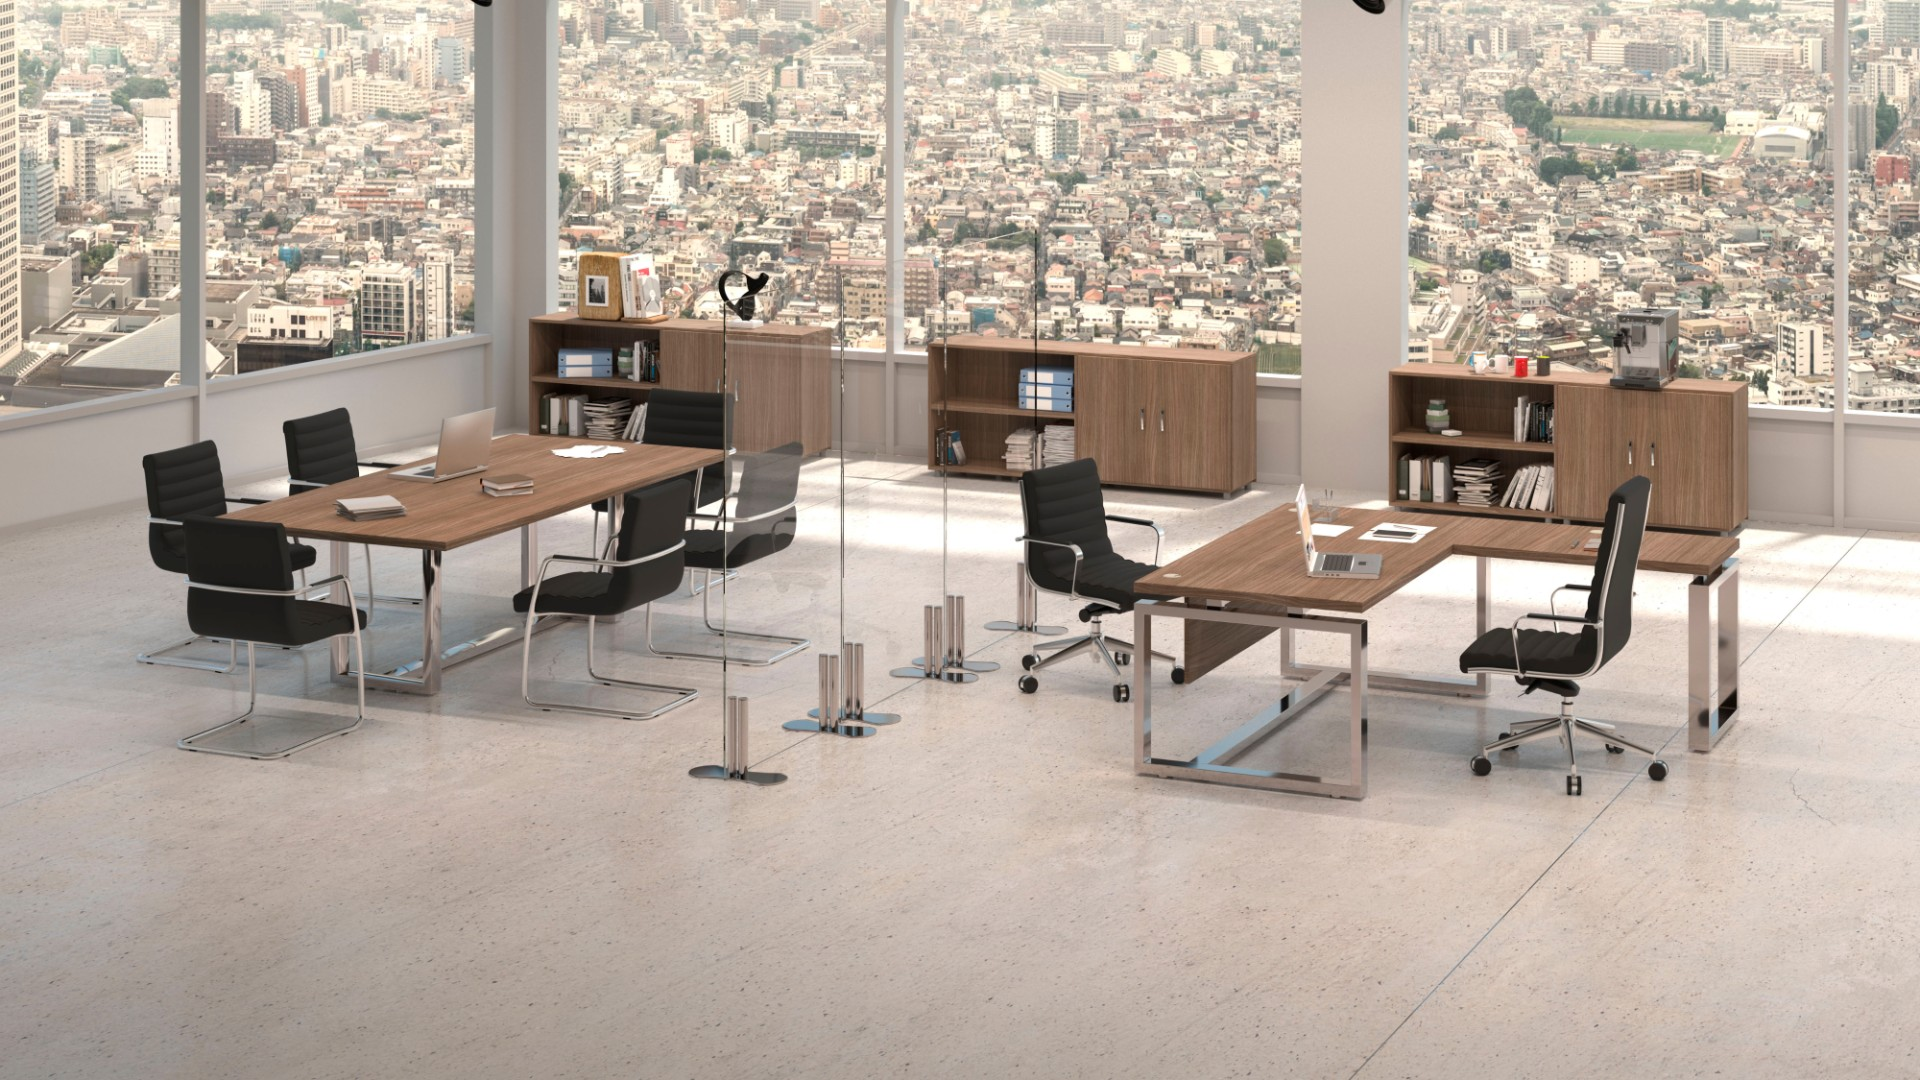 Muebles de oficina madrid centro officedeco for Muebles oficina madrid